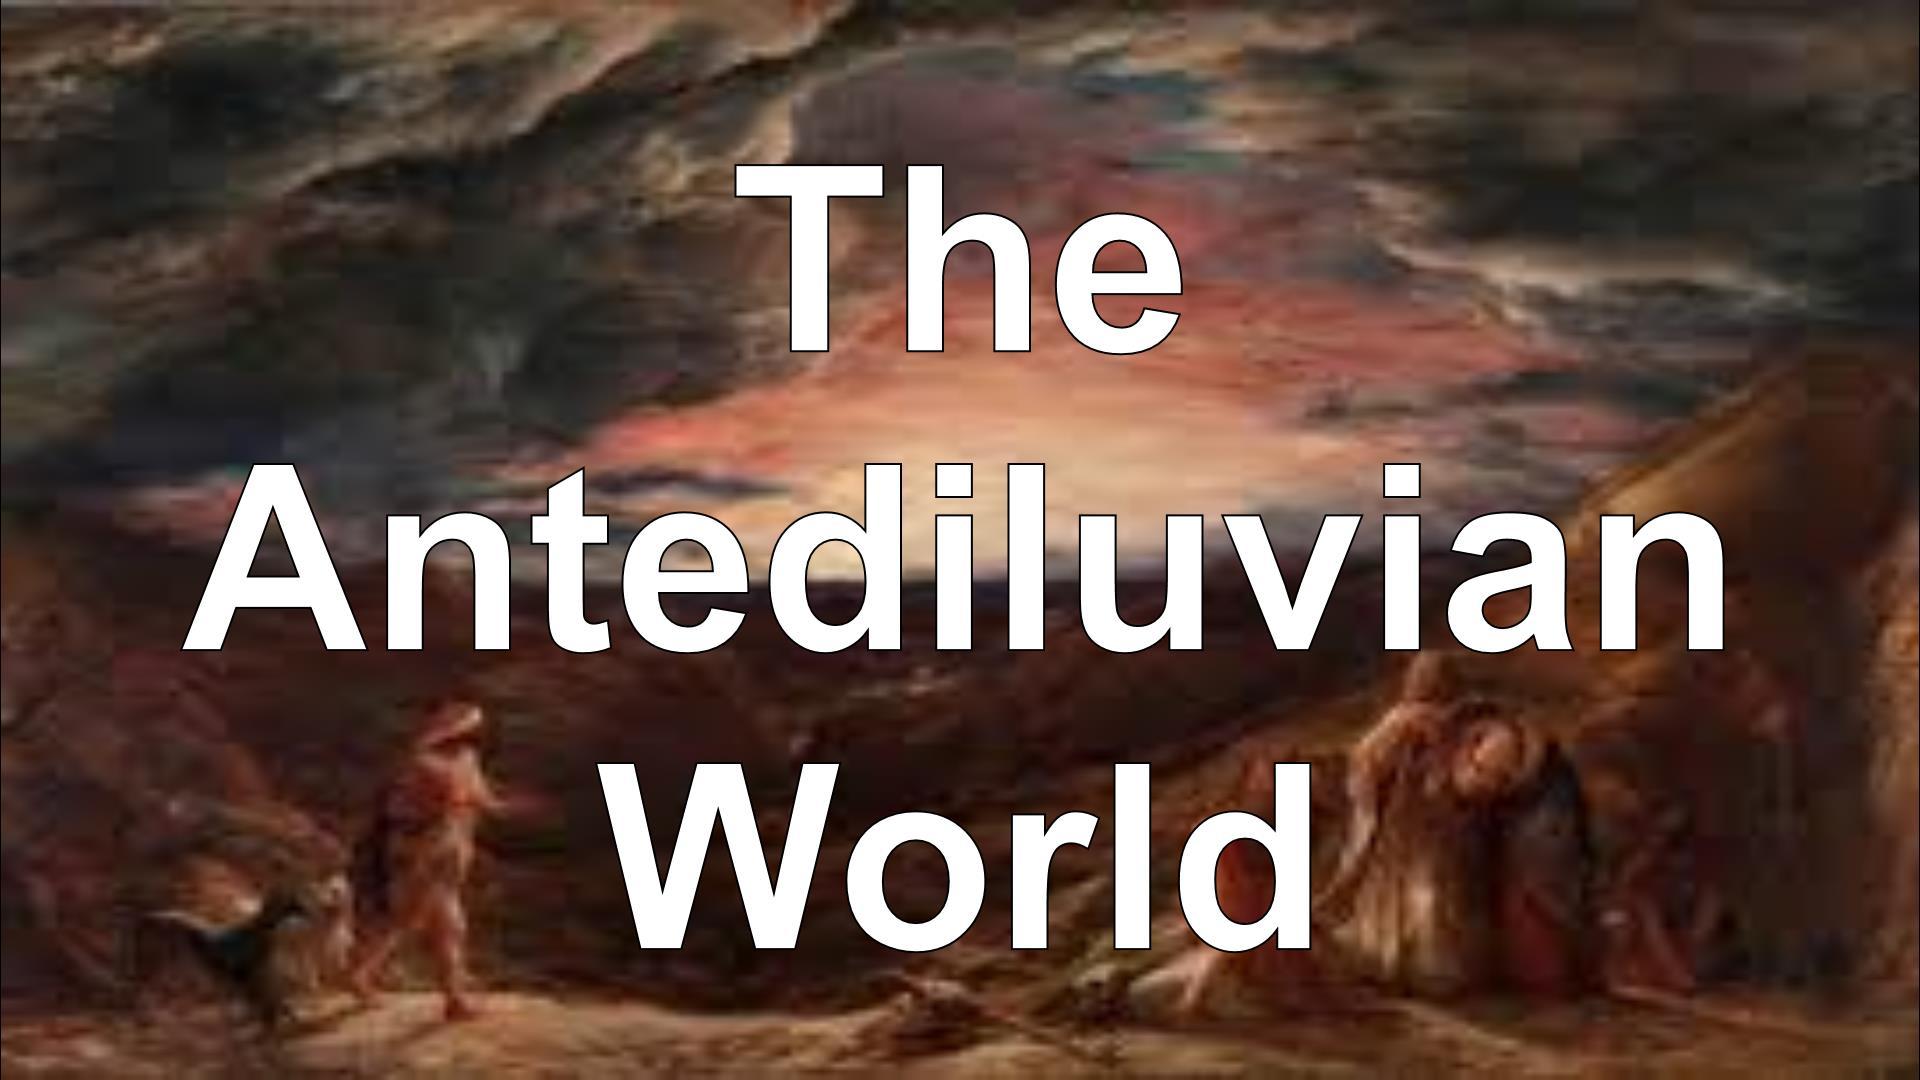 The Antediluvian World